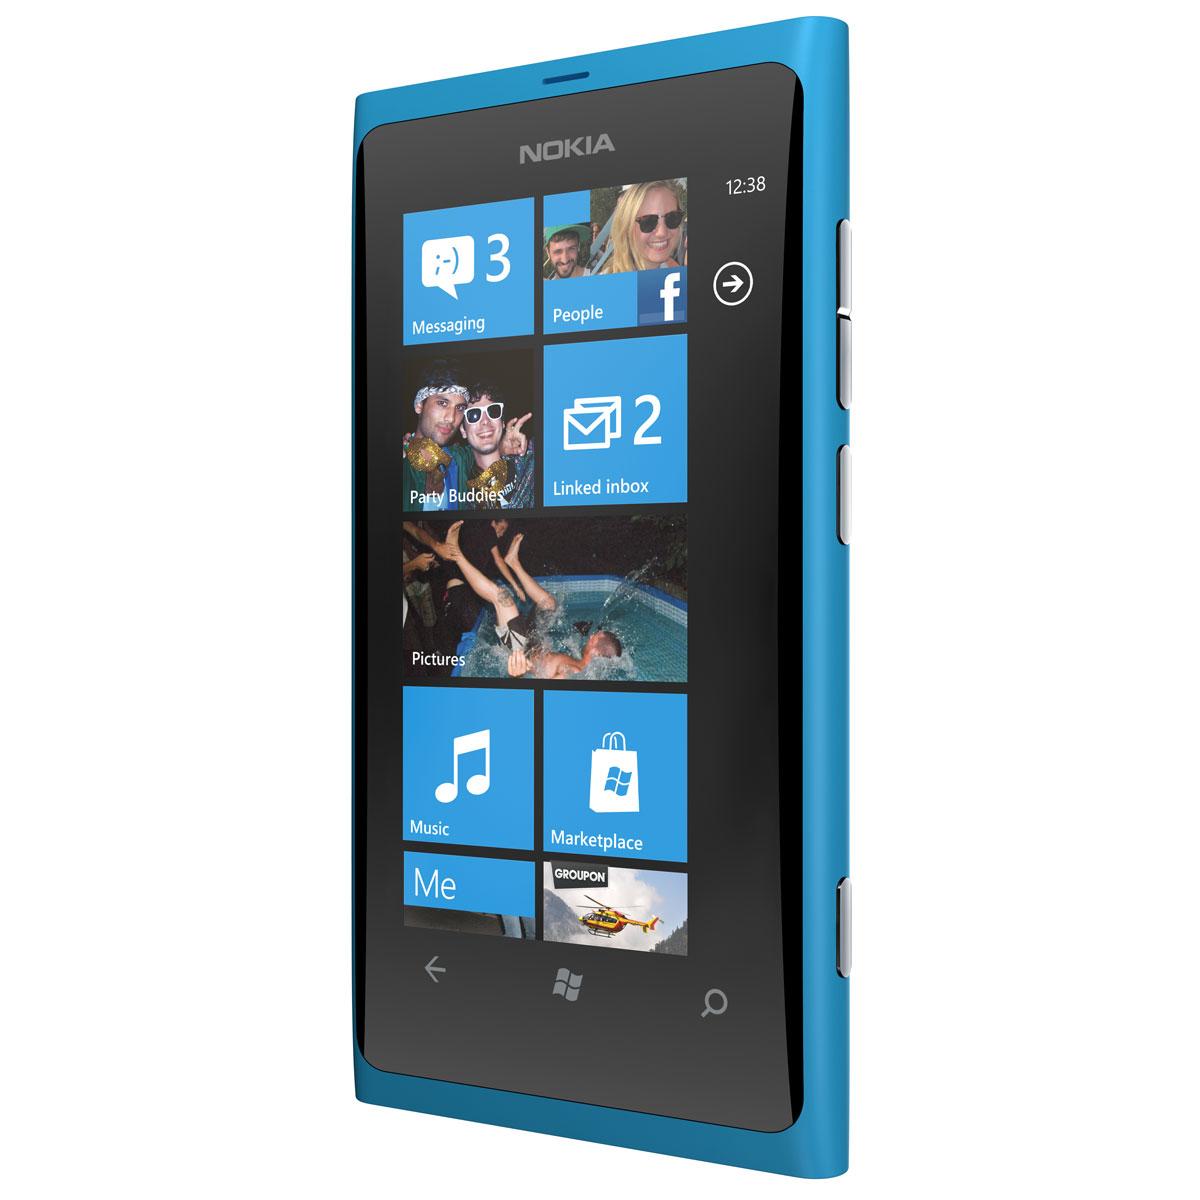 "Mobile & smartphone Nokia Lumia 800 Cyan Smartphone 3G+ avec écran tactile intégral 3.7"" sous Windows Phone 7.5"